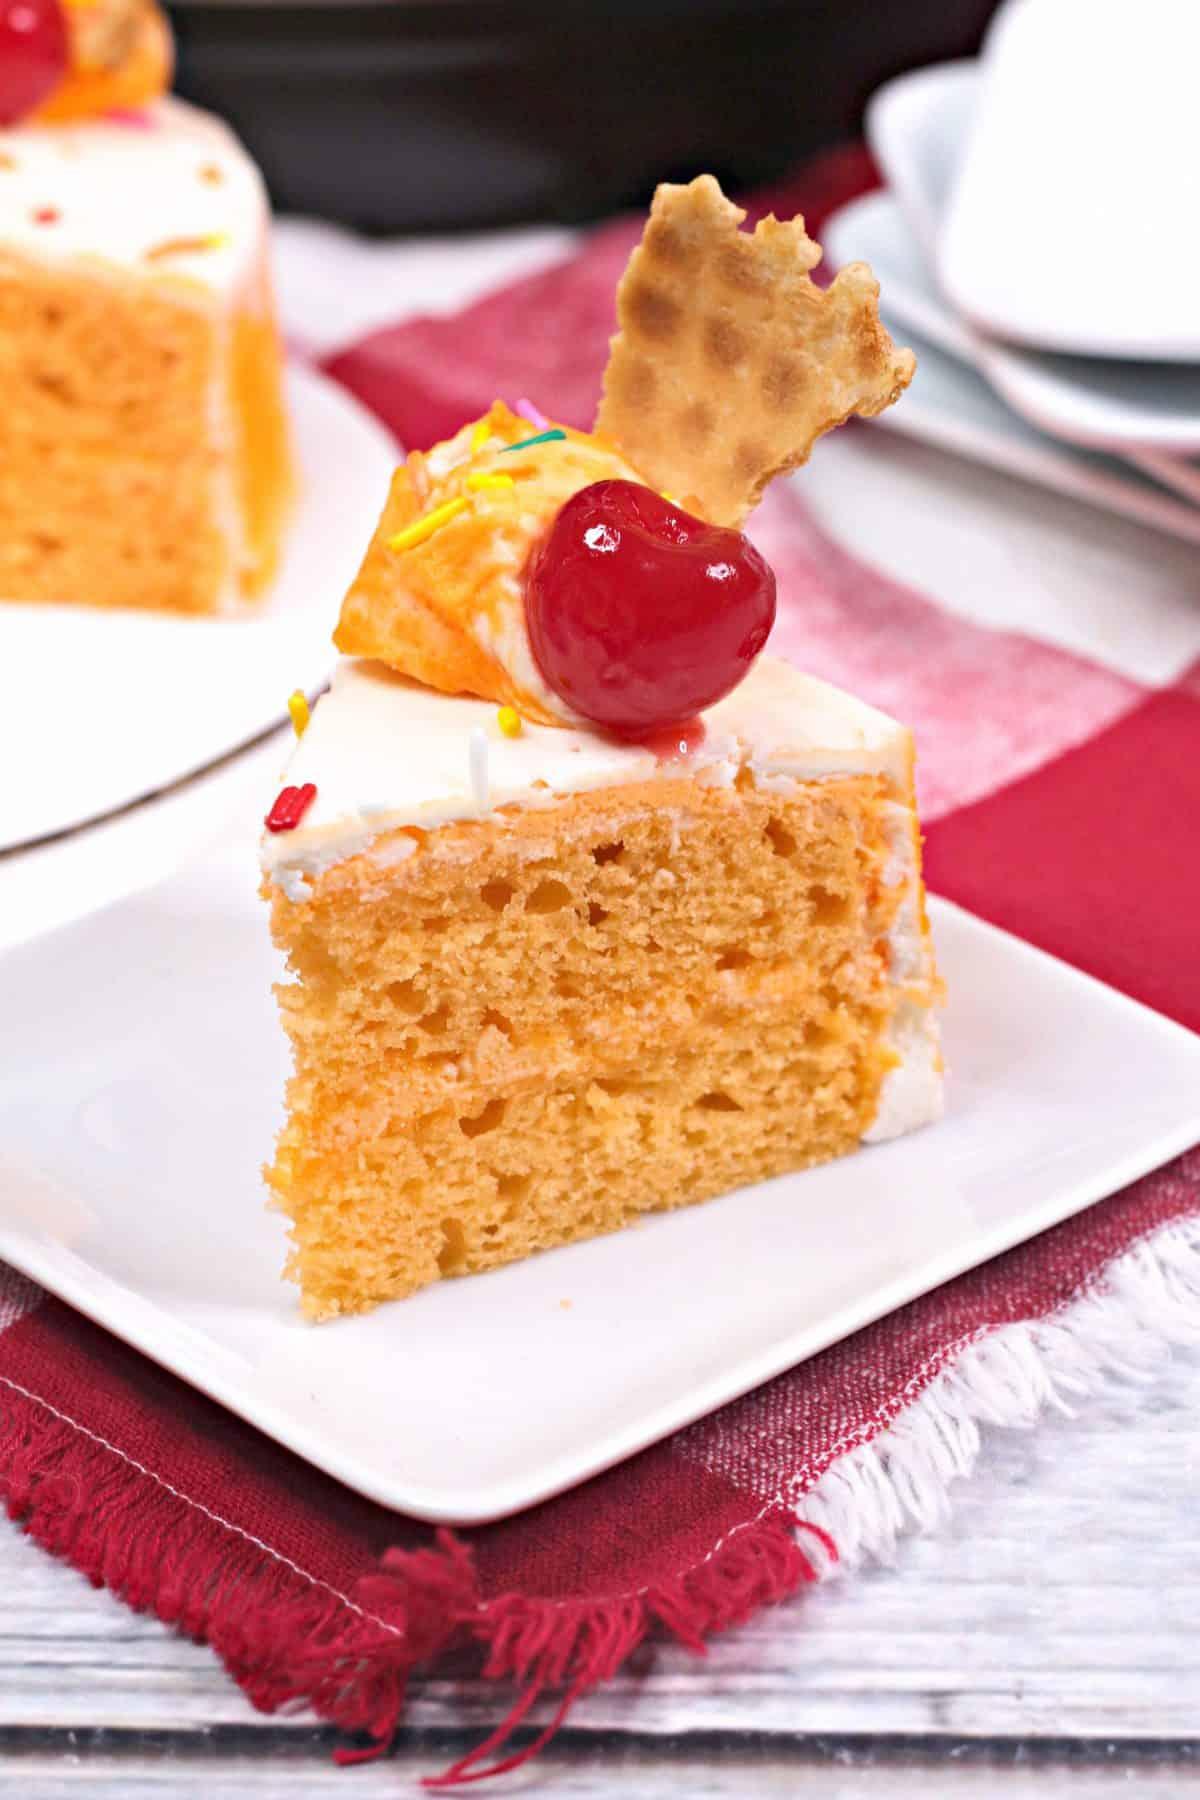 Instant pot cake, Instant pot orange cake